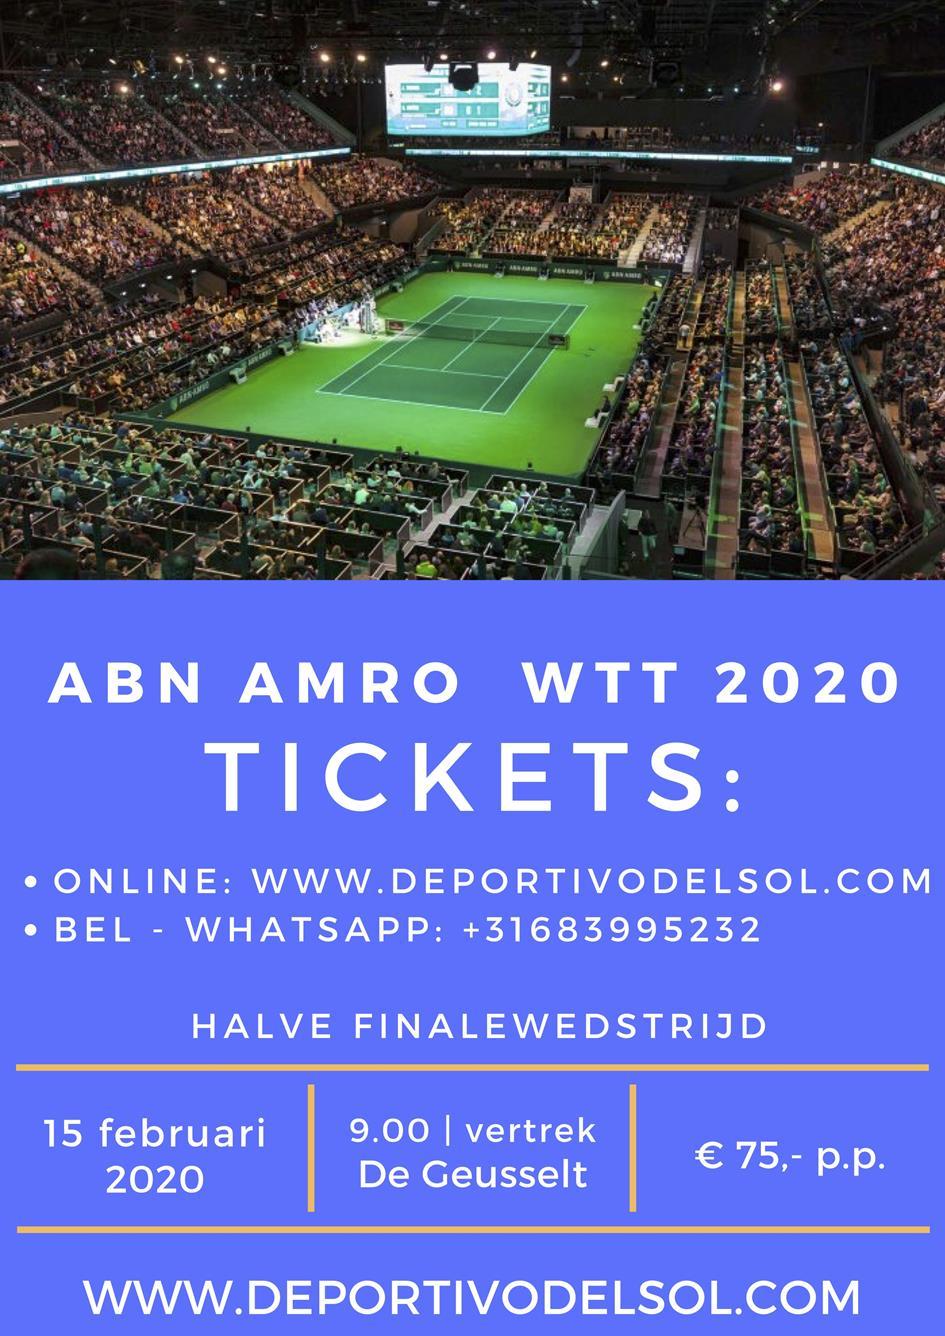 ABN AMRO 2020 flyer .jpg